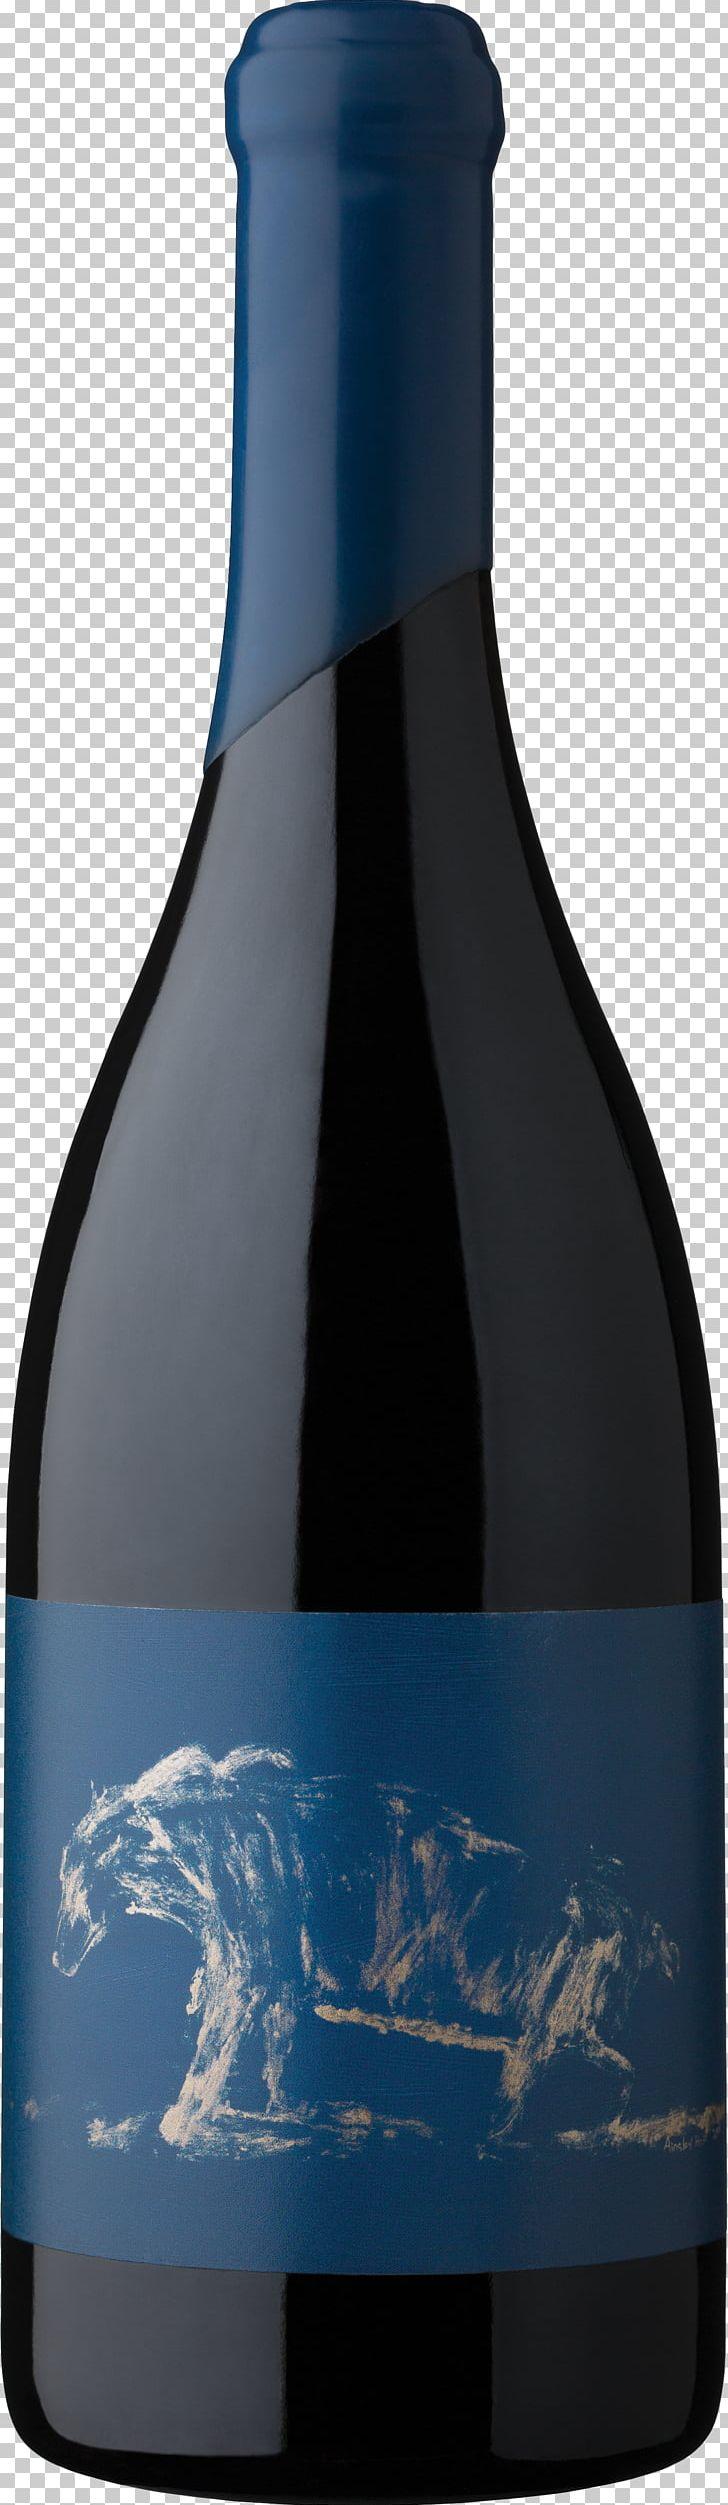 Wine Glass Bottle Liquid PNG, Clipart, Austin Hope Winery, Bottle, Drink, Drinkware, Food Drinks Free PNG Download